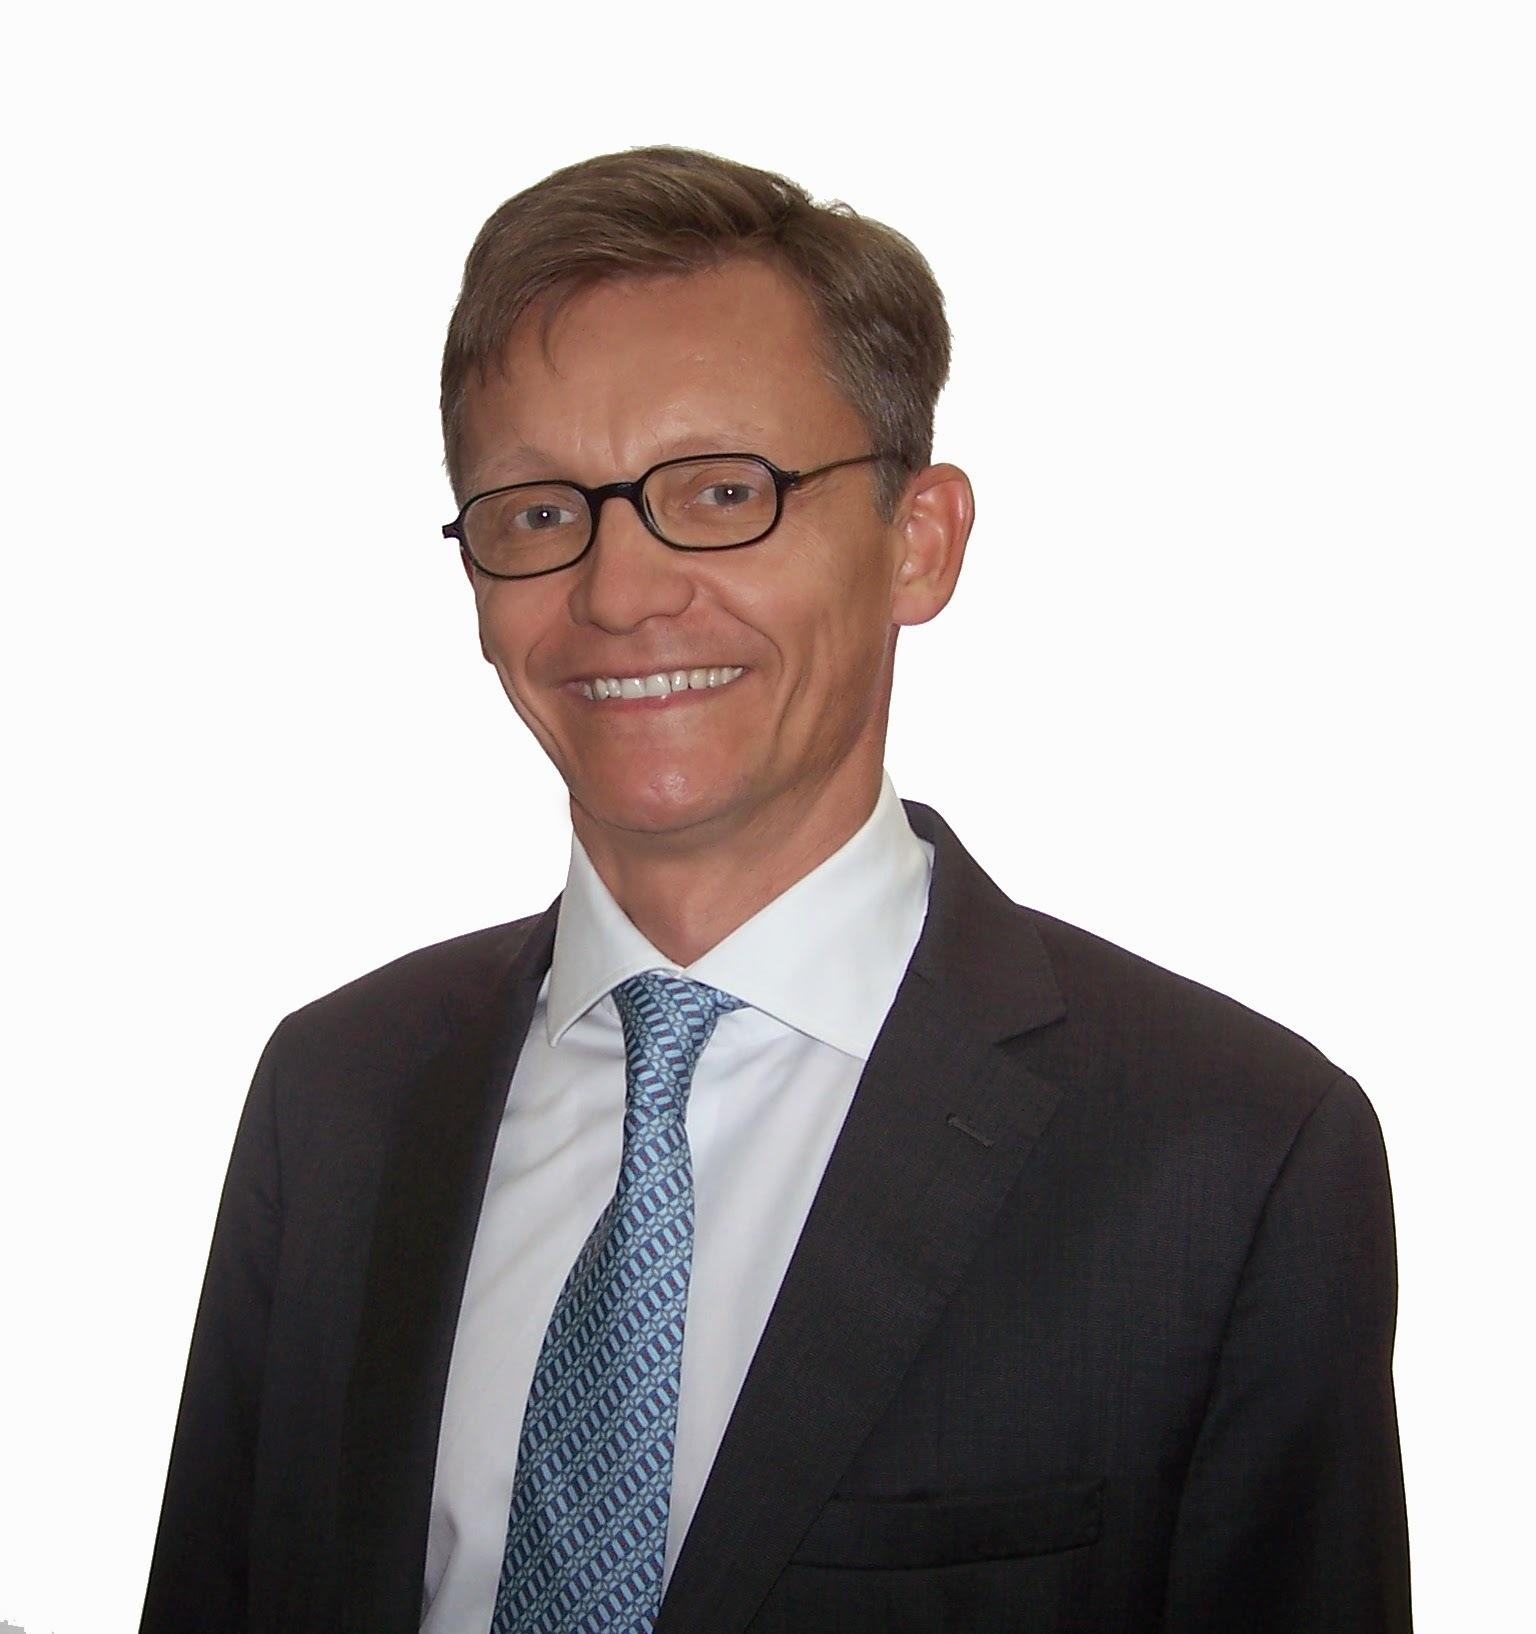 Matthieu de Tugny, senior vice-president and head of offshore BV